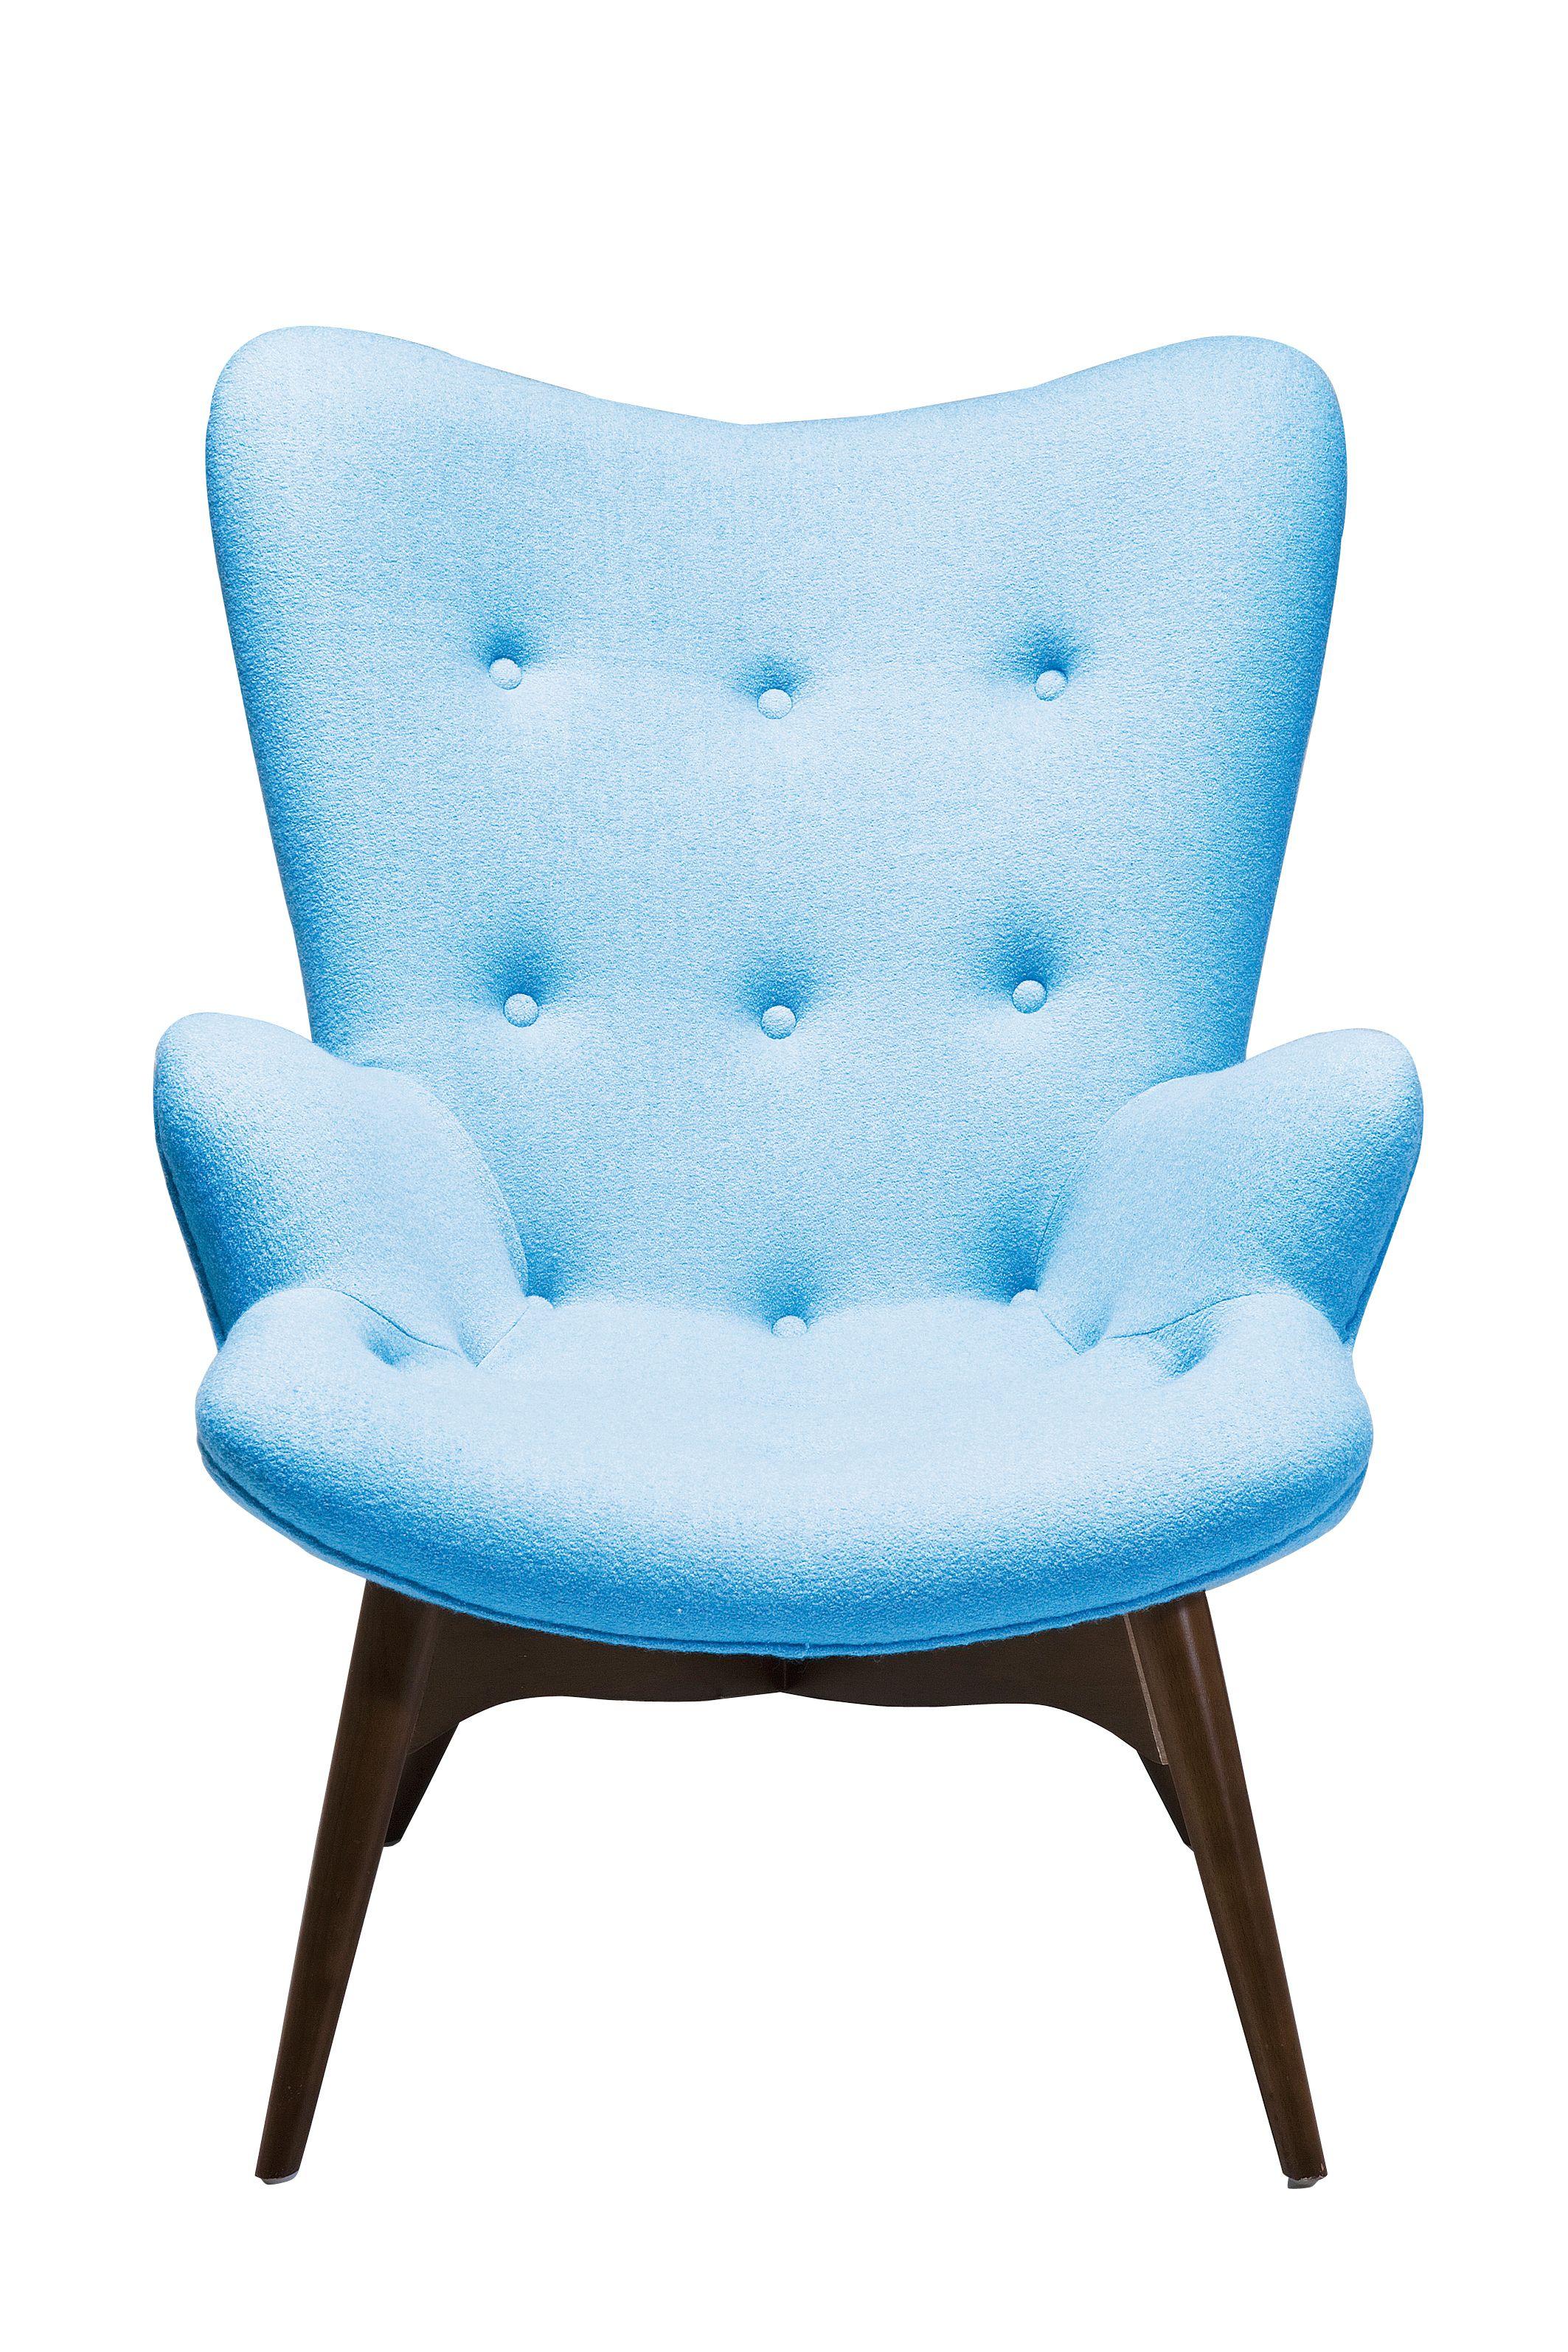 Ausgefallener Sessel In Extravagantem Design Retro Inspirierte Form